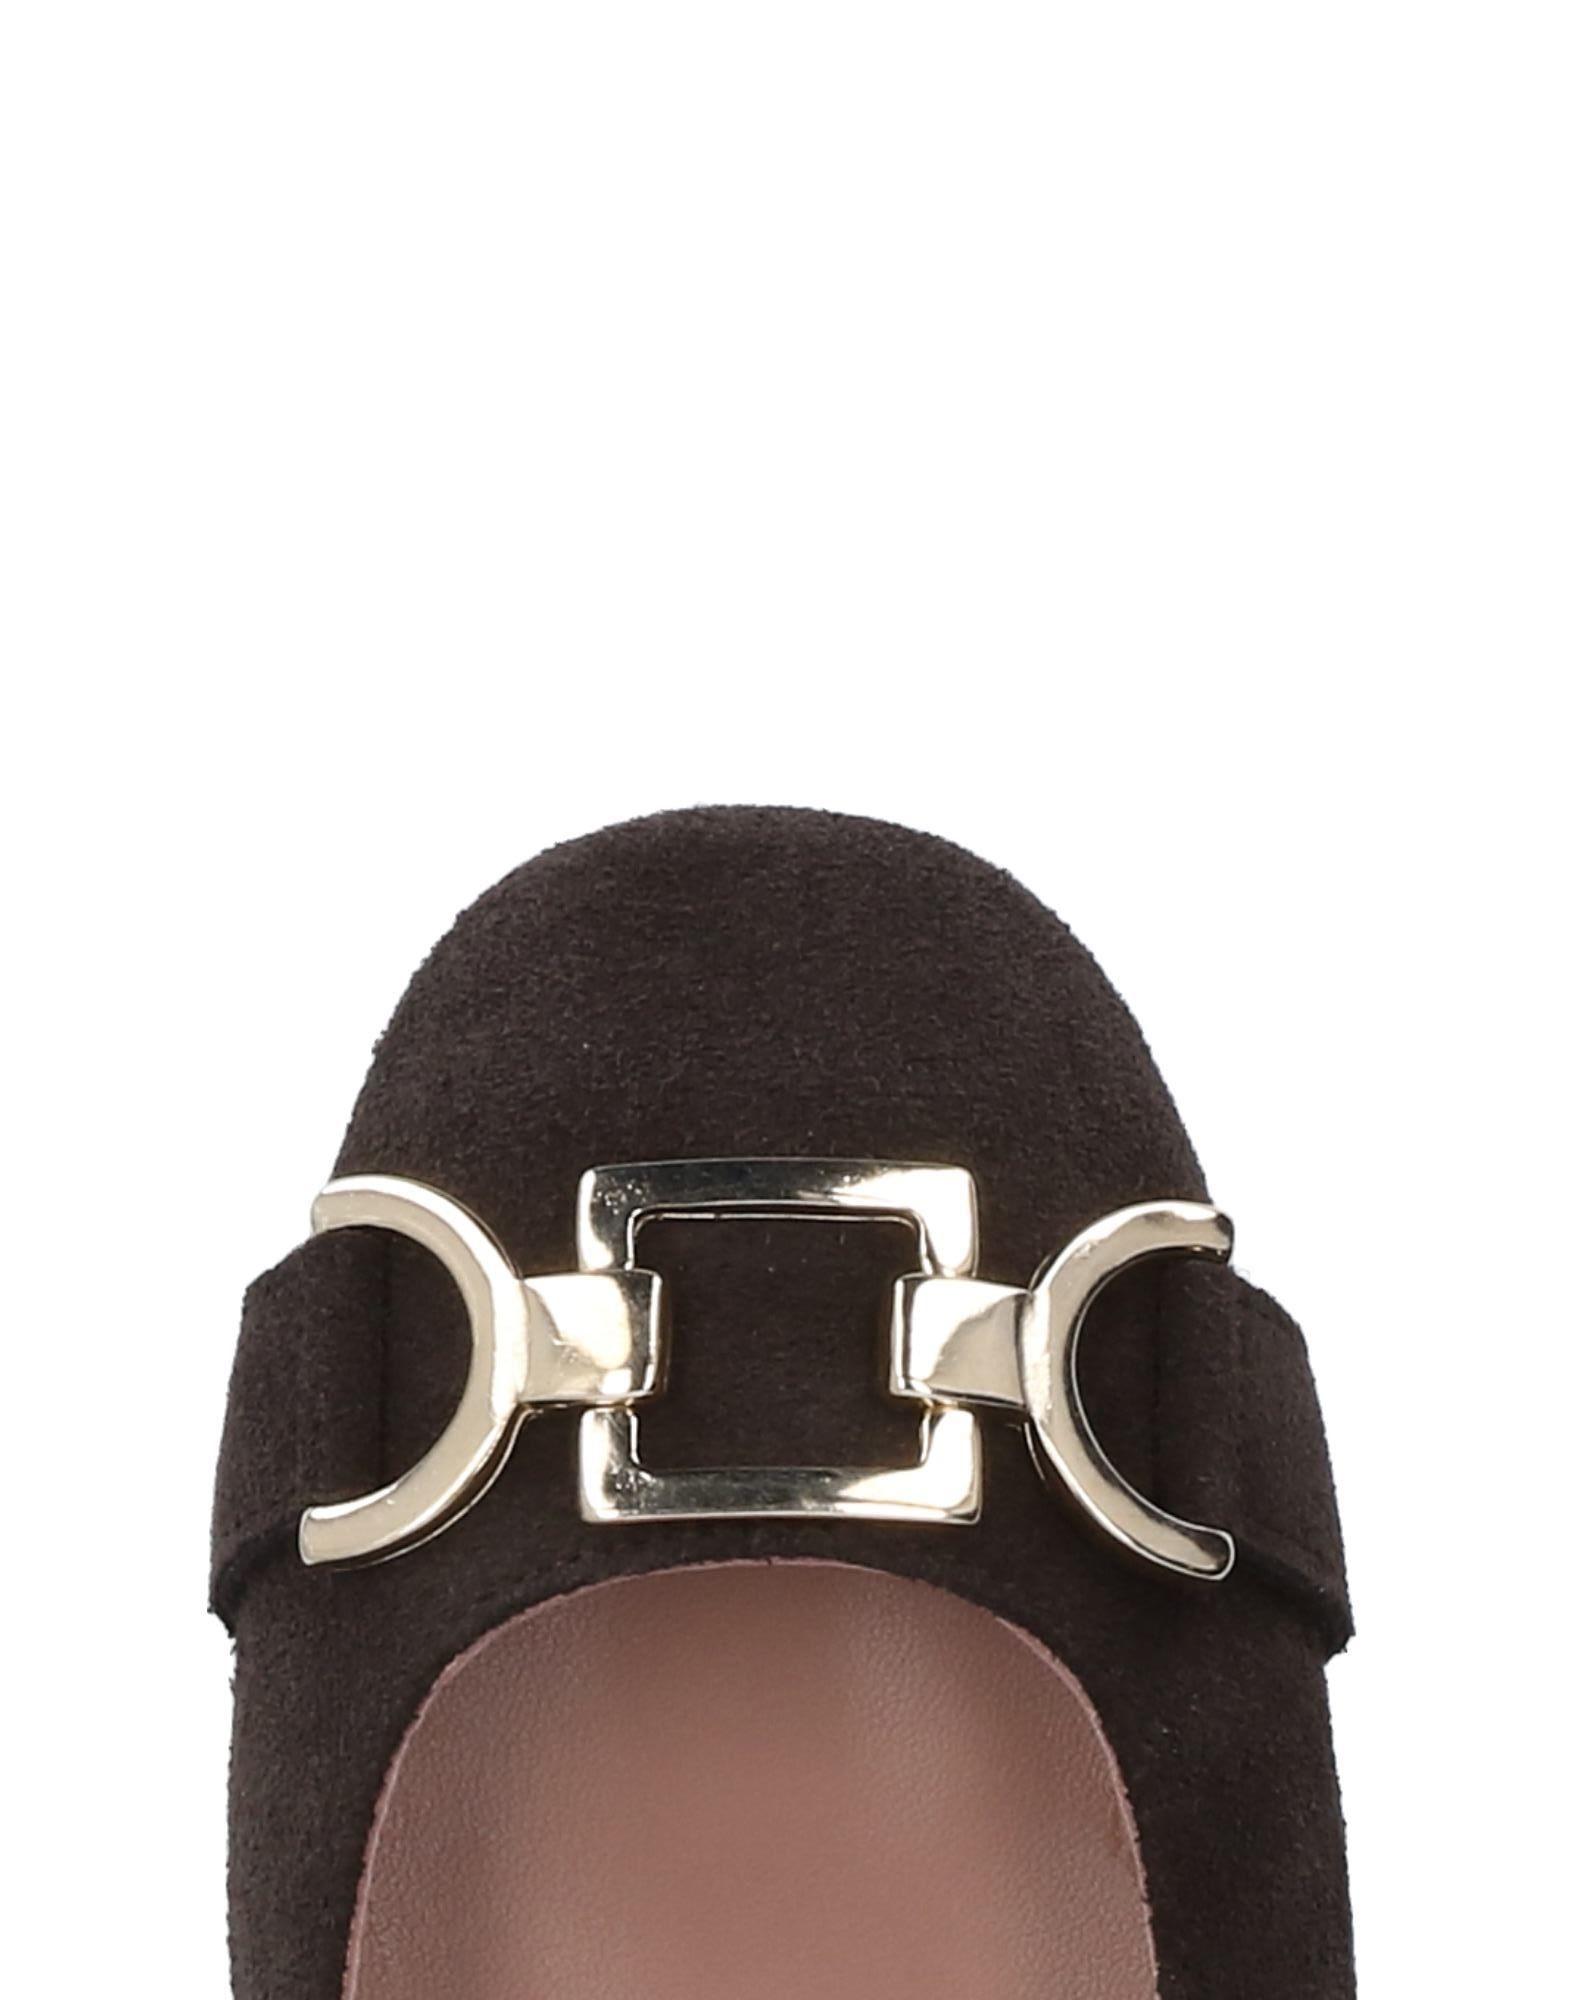 Stilvolle Pumps billige Schuhe Settantatre Lr Pumps Stilvolle Damen  11515395TG 516e3a